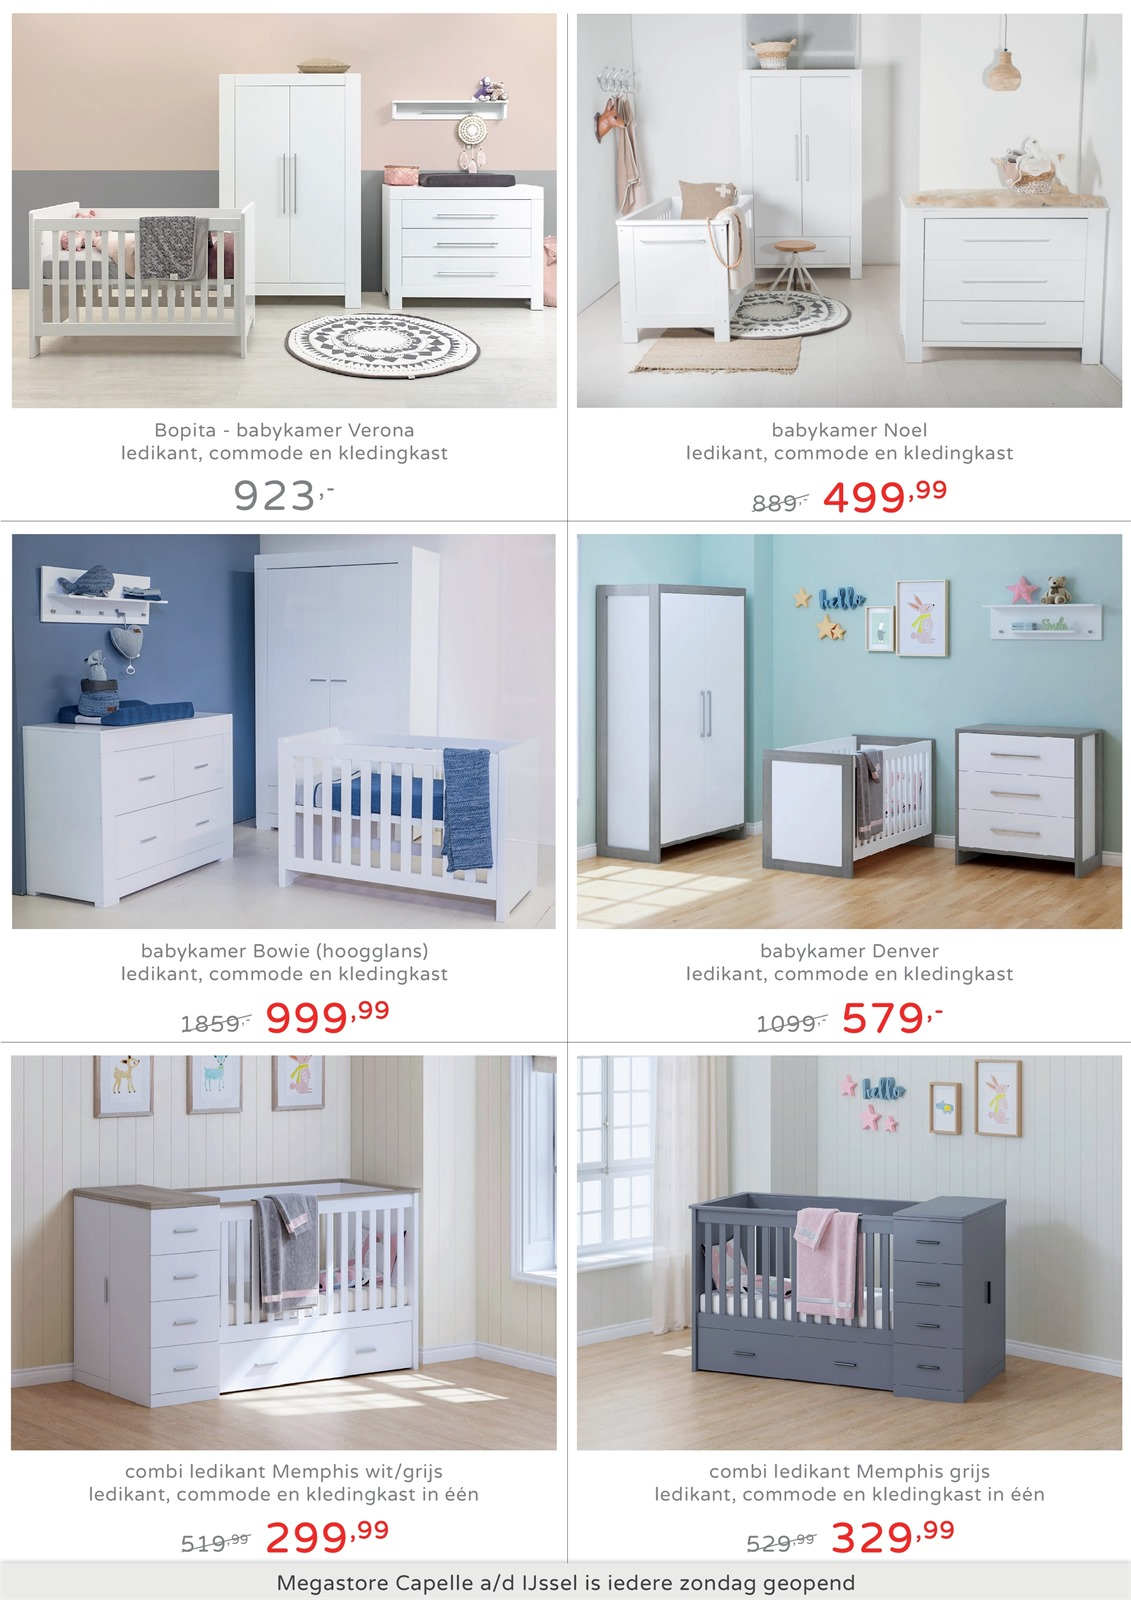 Babykamer Denver Babydump.Folder Baby En Tiener Megastore Van 05 08 2019 Tot 11 08